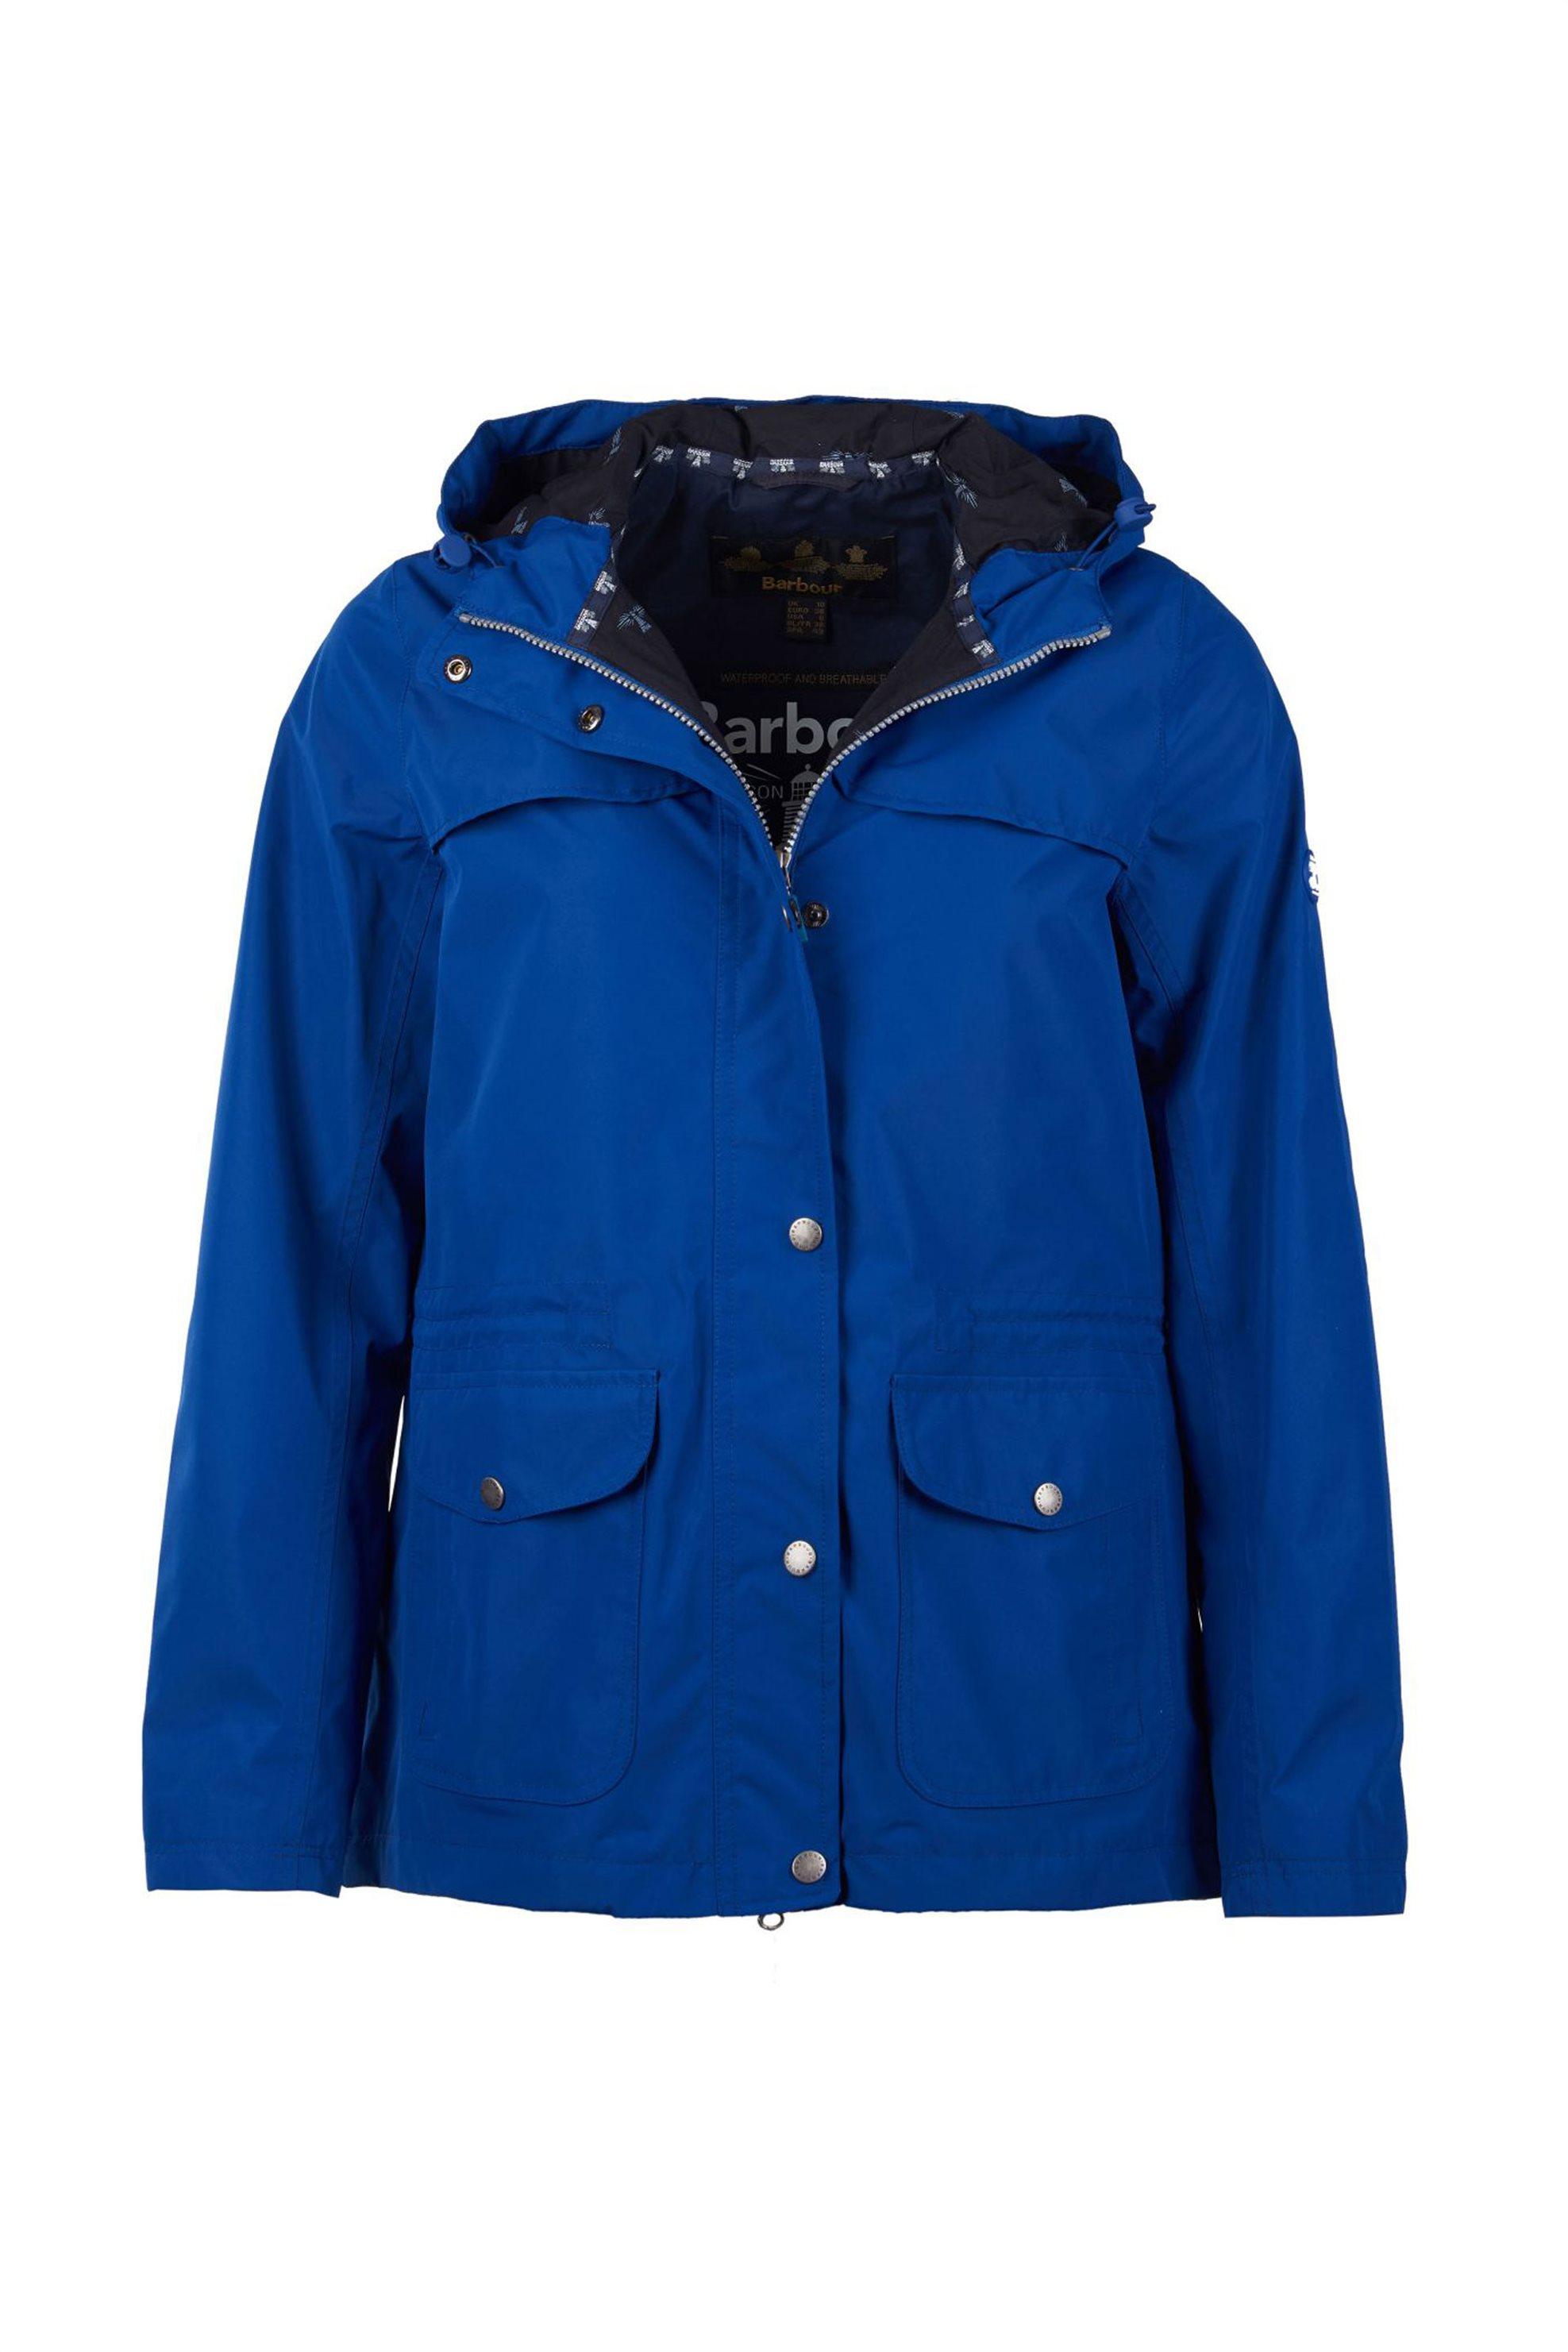 aea5e5e90fb Barbour Lunan γυναικείο μπουφάν αδιάβροχο - LWB0478 - Μπλε Ηλεκτρίκ